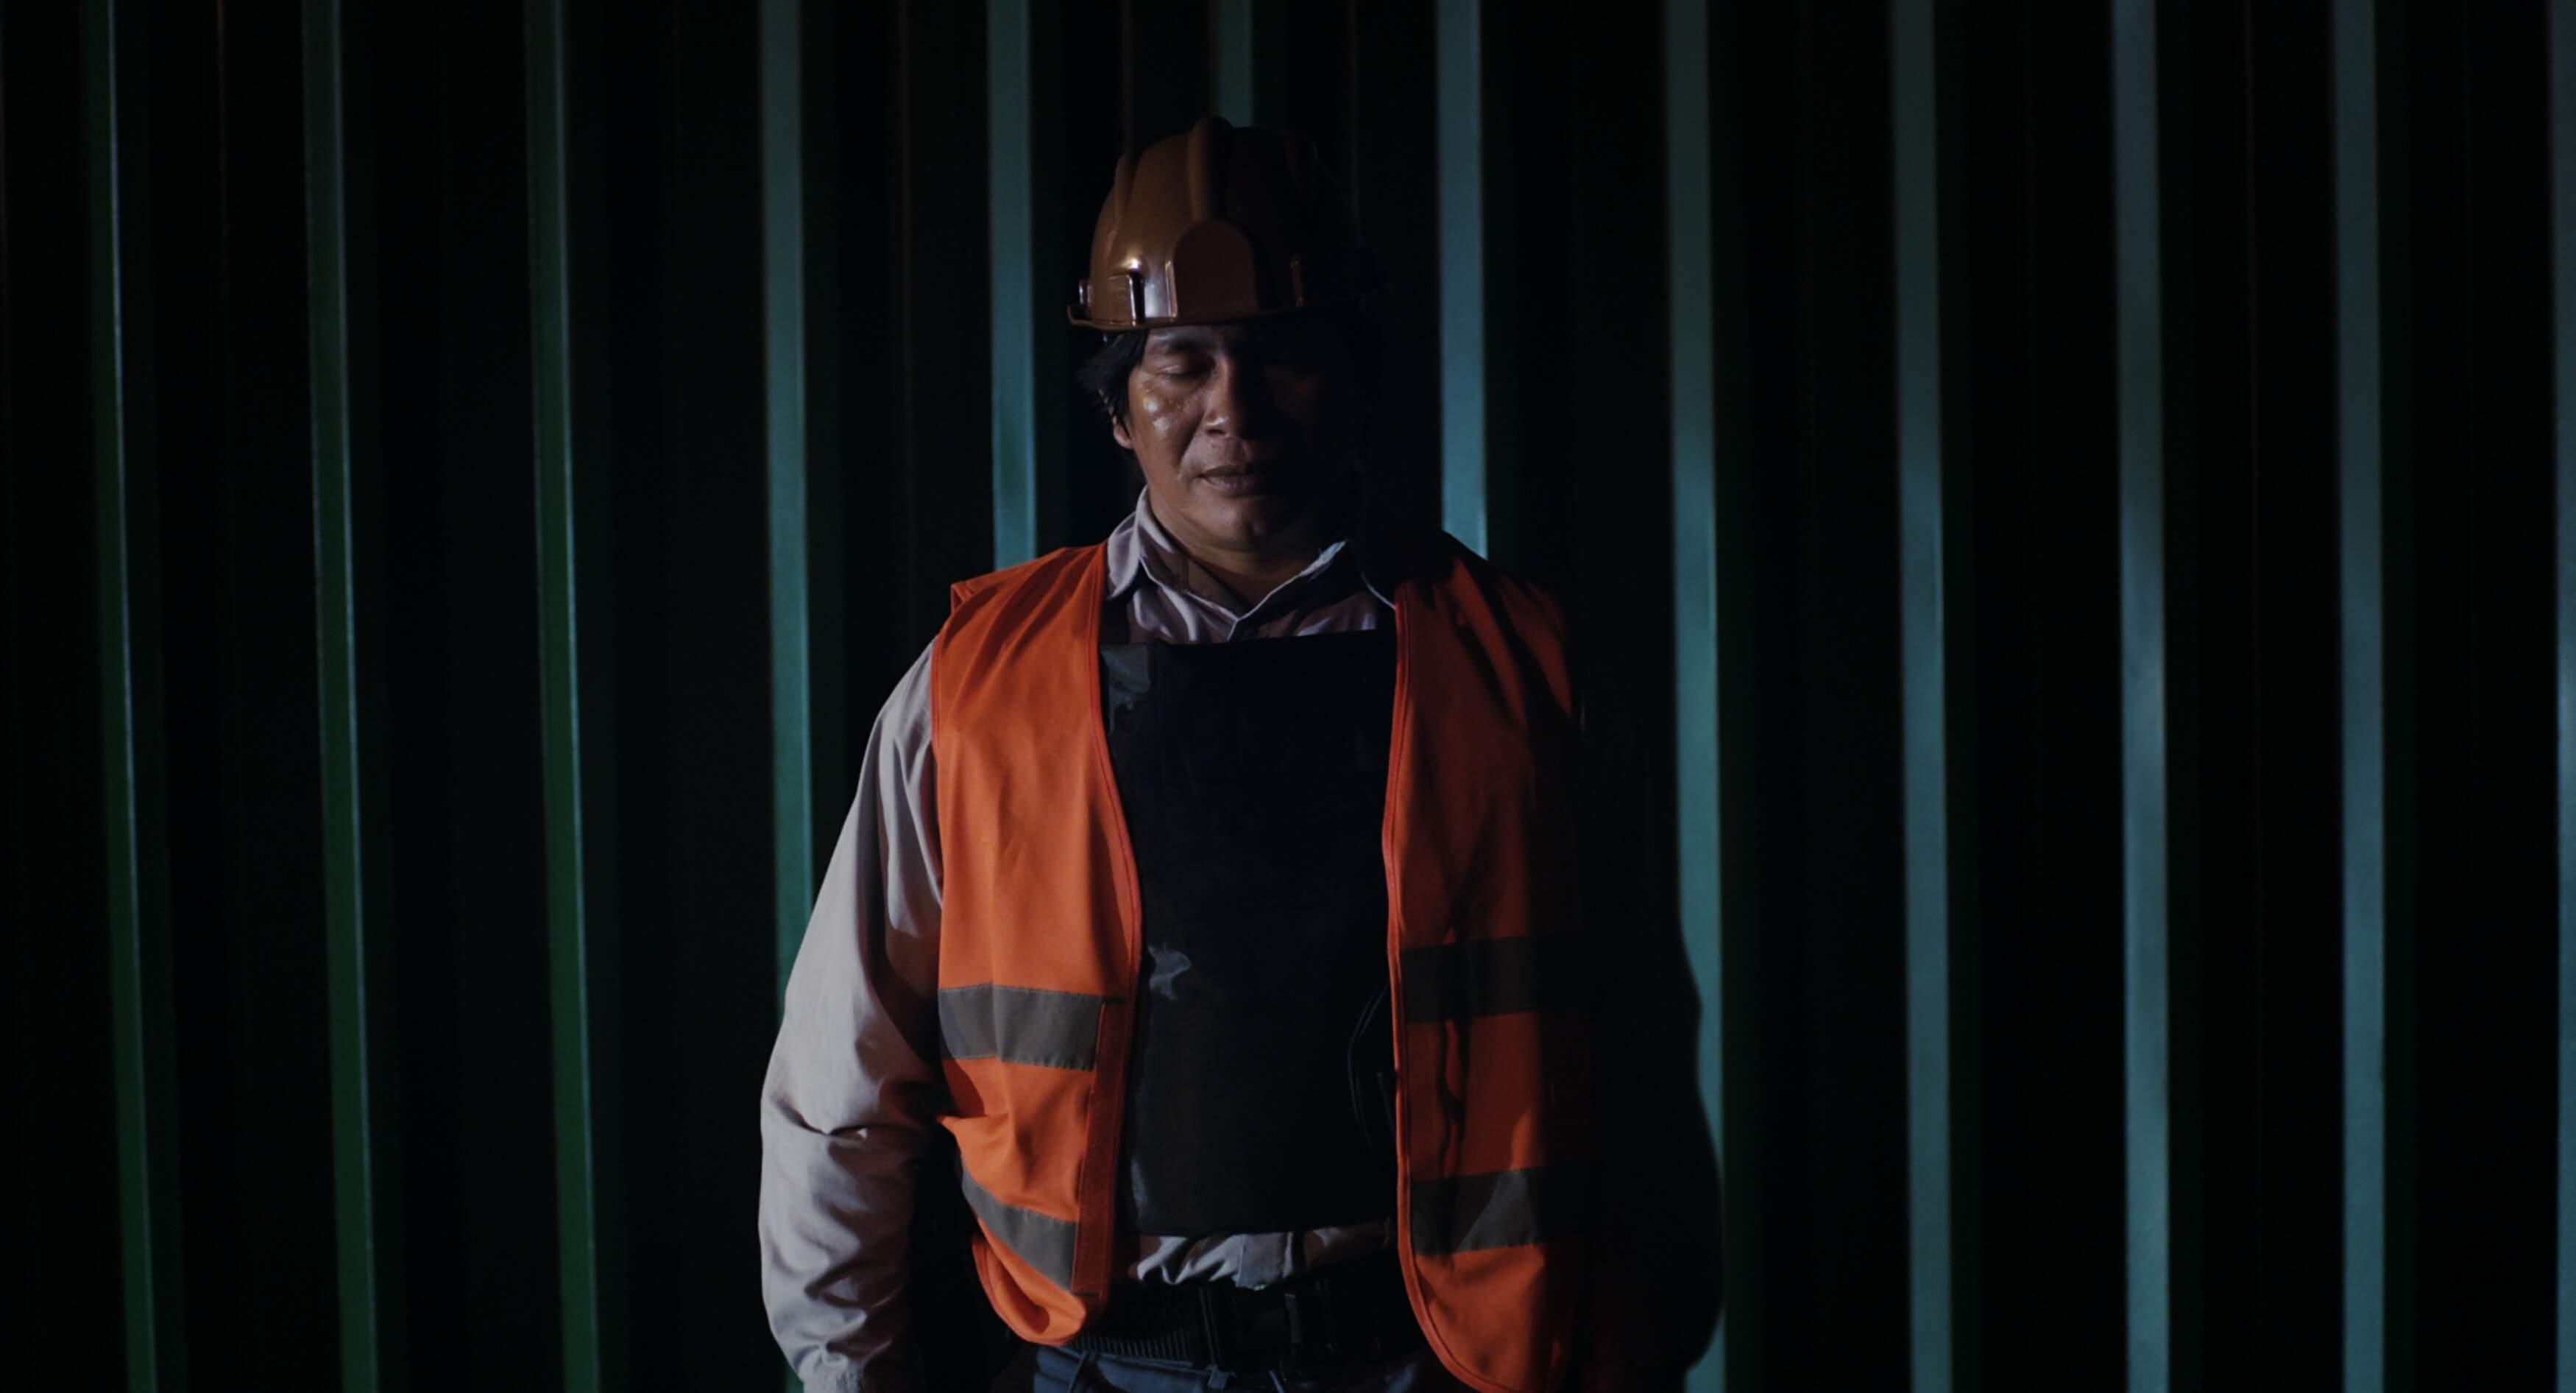 Longa 'A Febre', dirigido pela brasileira Maya Da-Rin, estreia nesta semana na Netflix